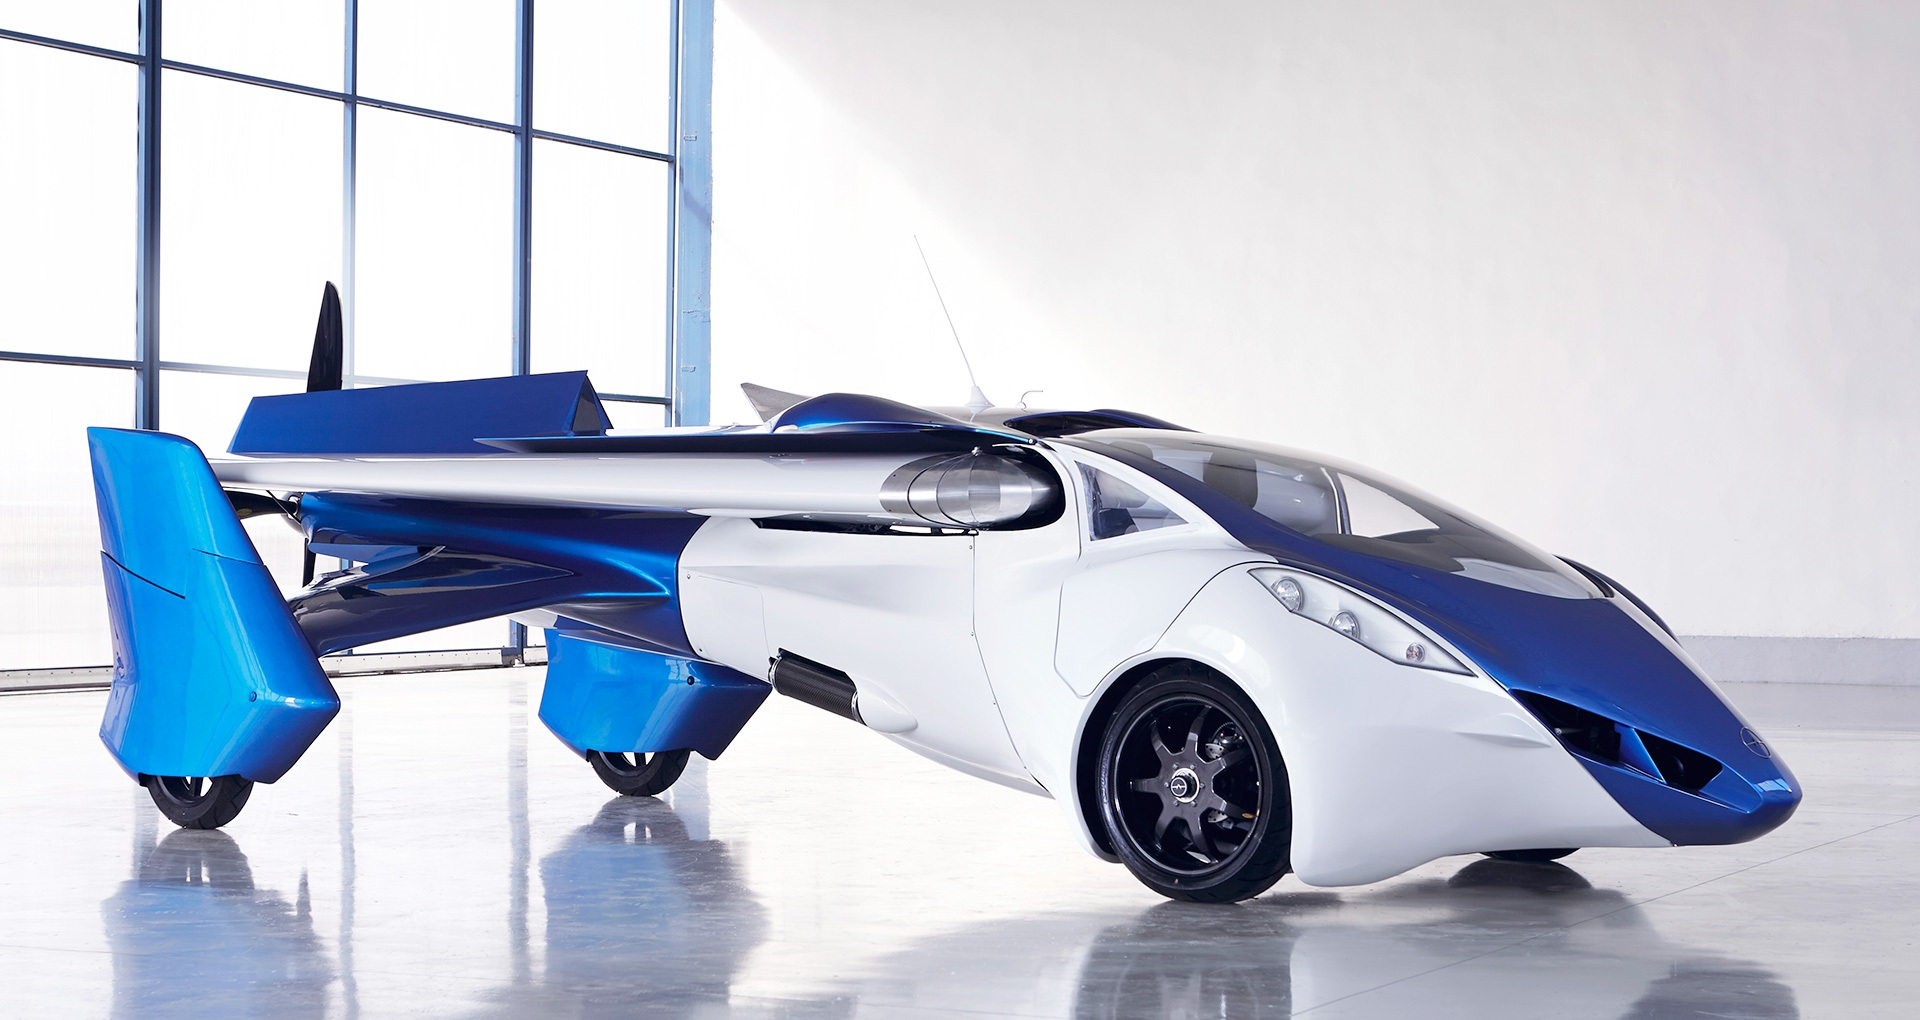 Slovak project AeroMobil